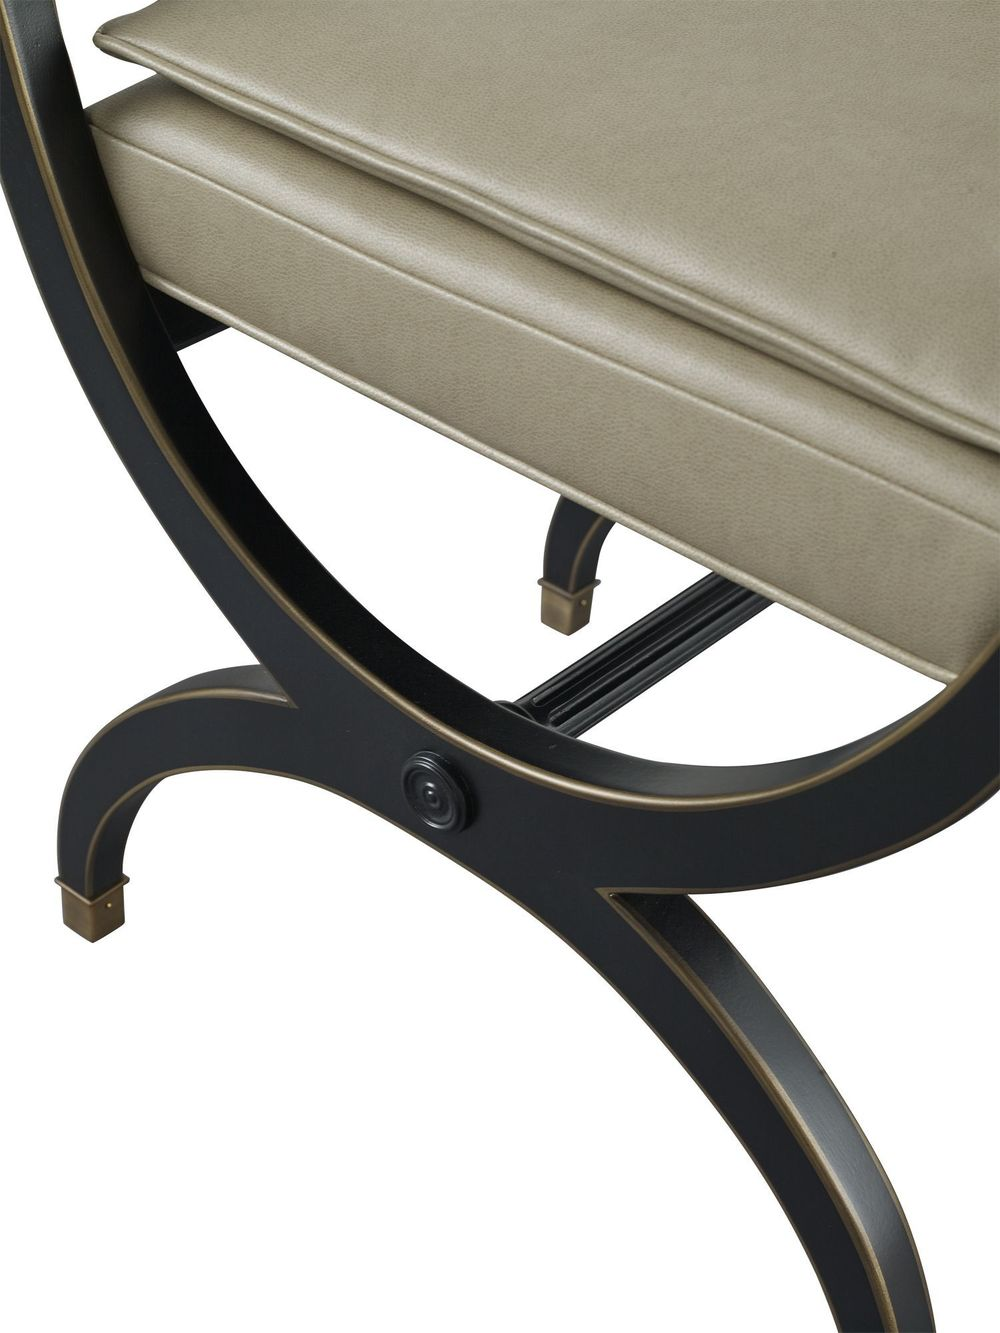 Baker Furniture - Malcom Bench